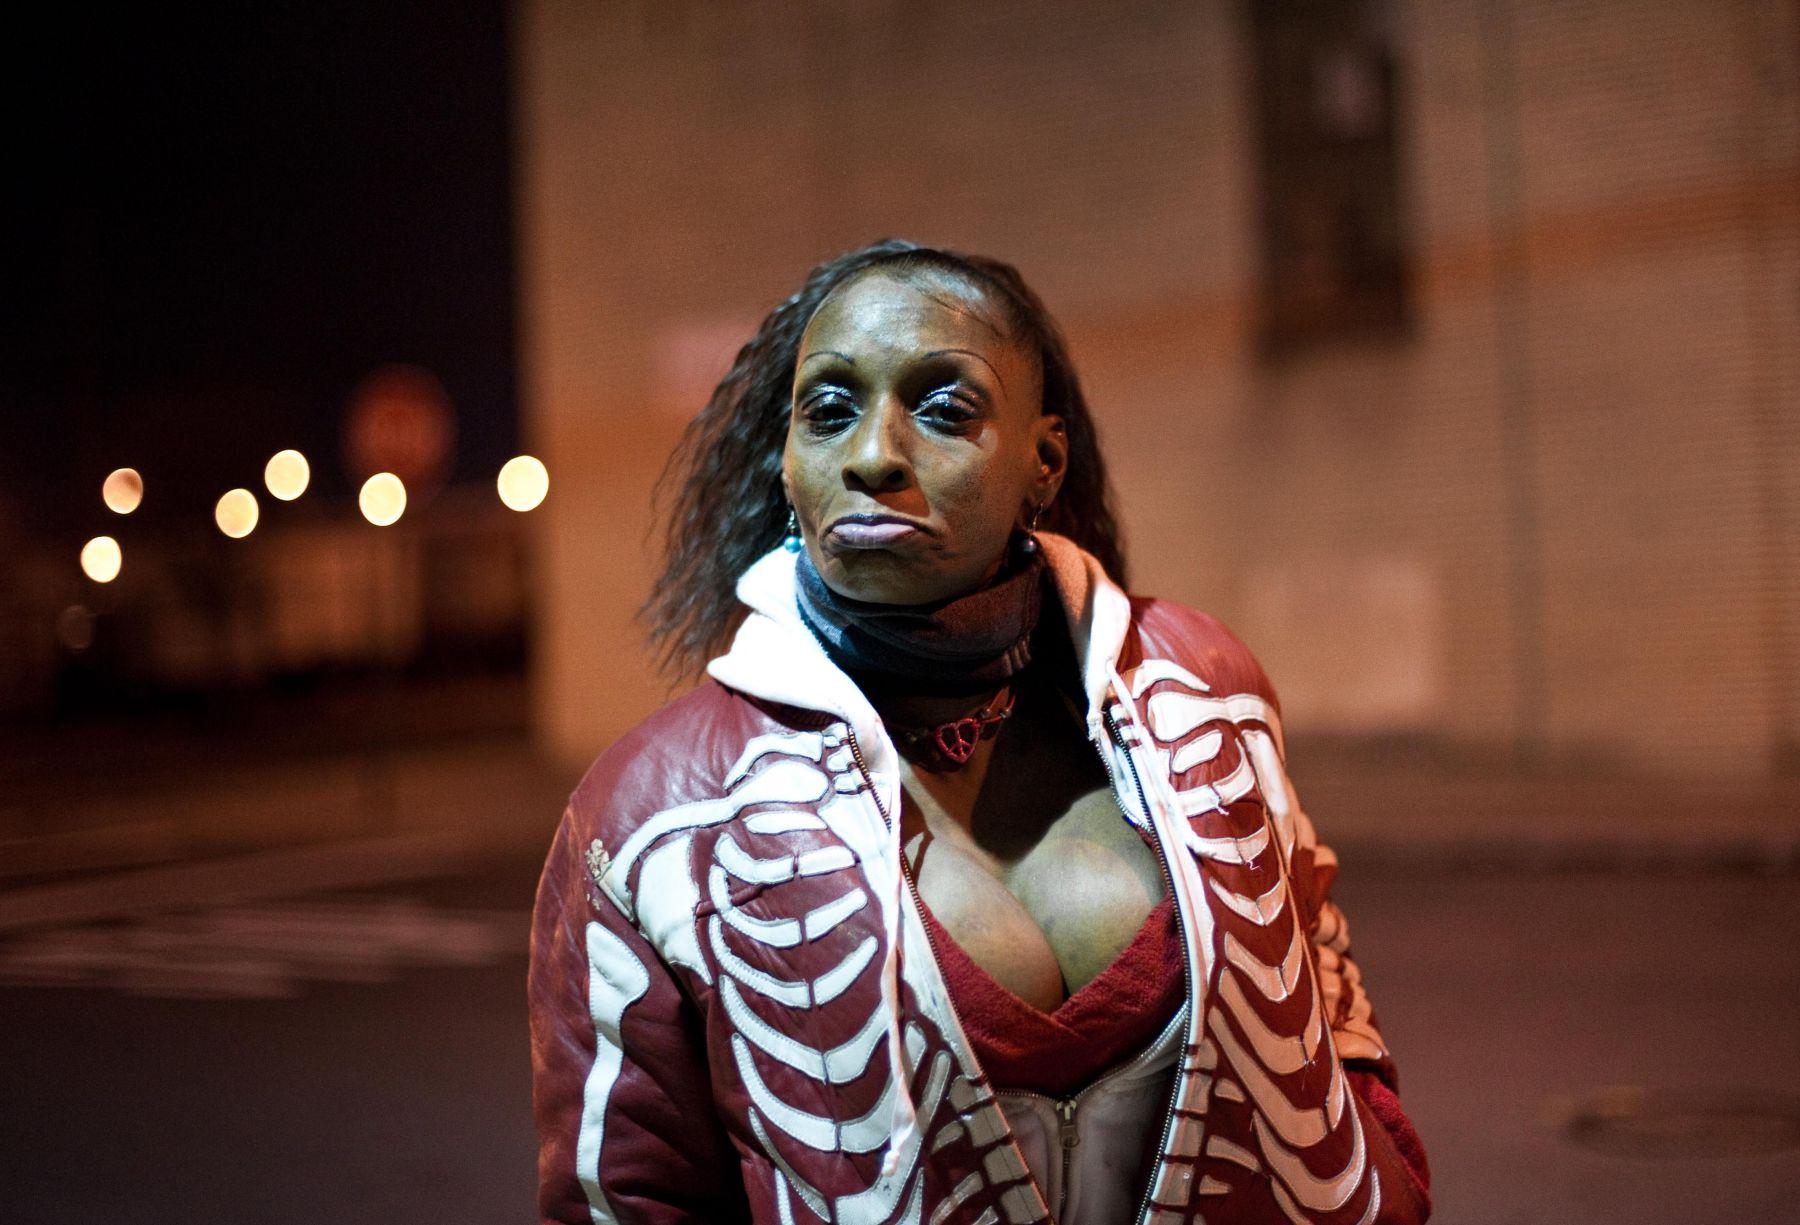 Woman at night by Chris Arnade